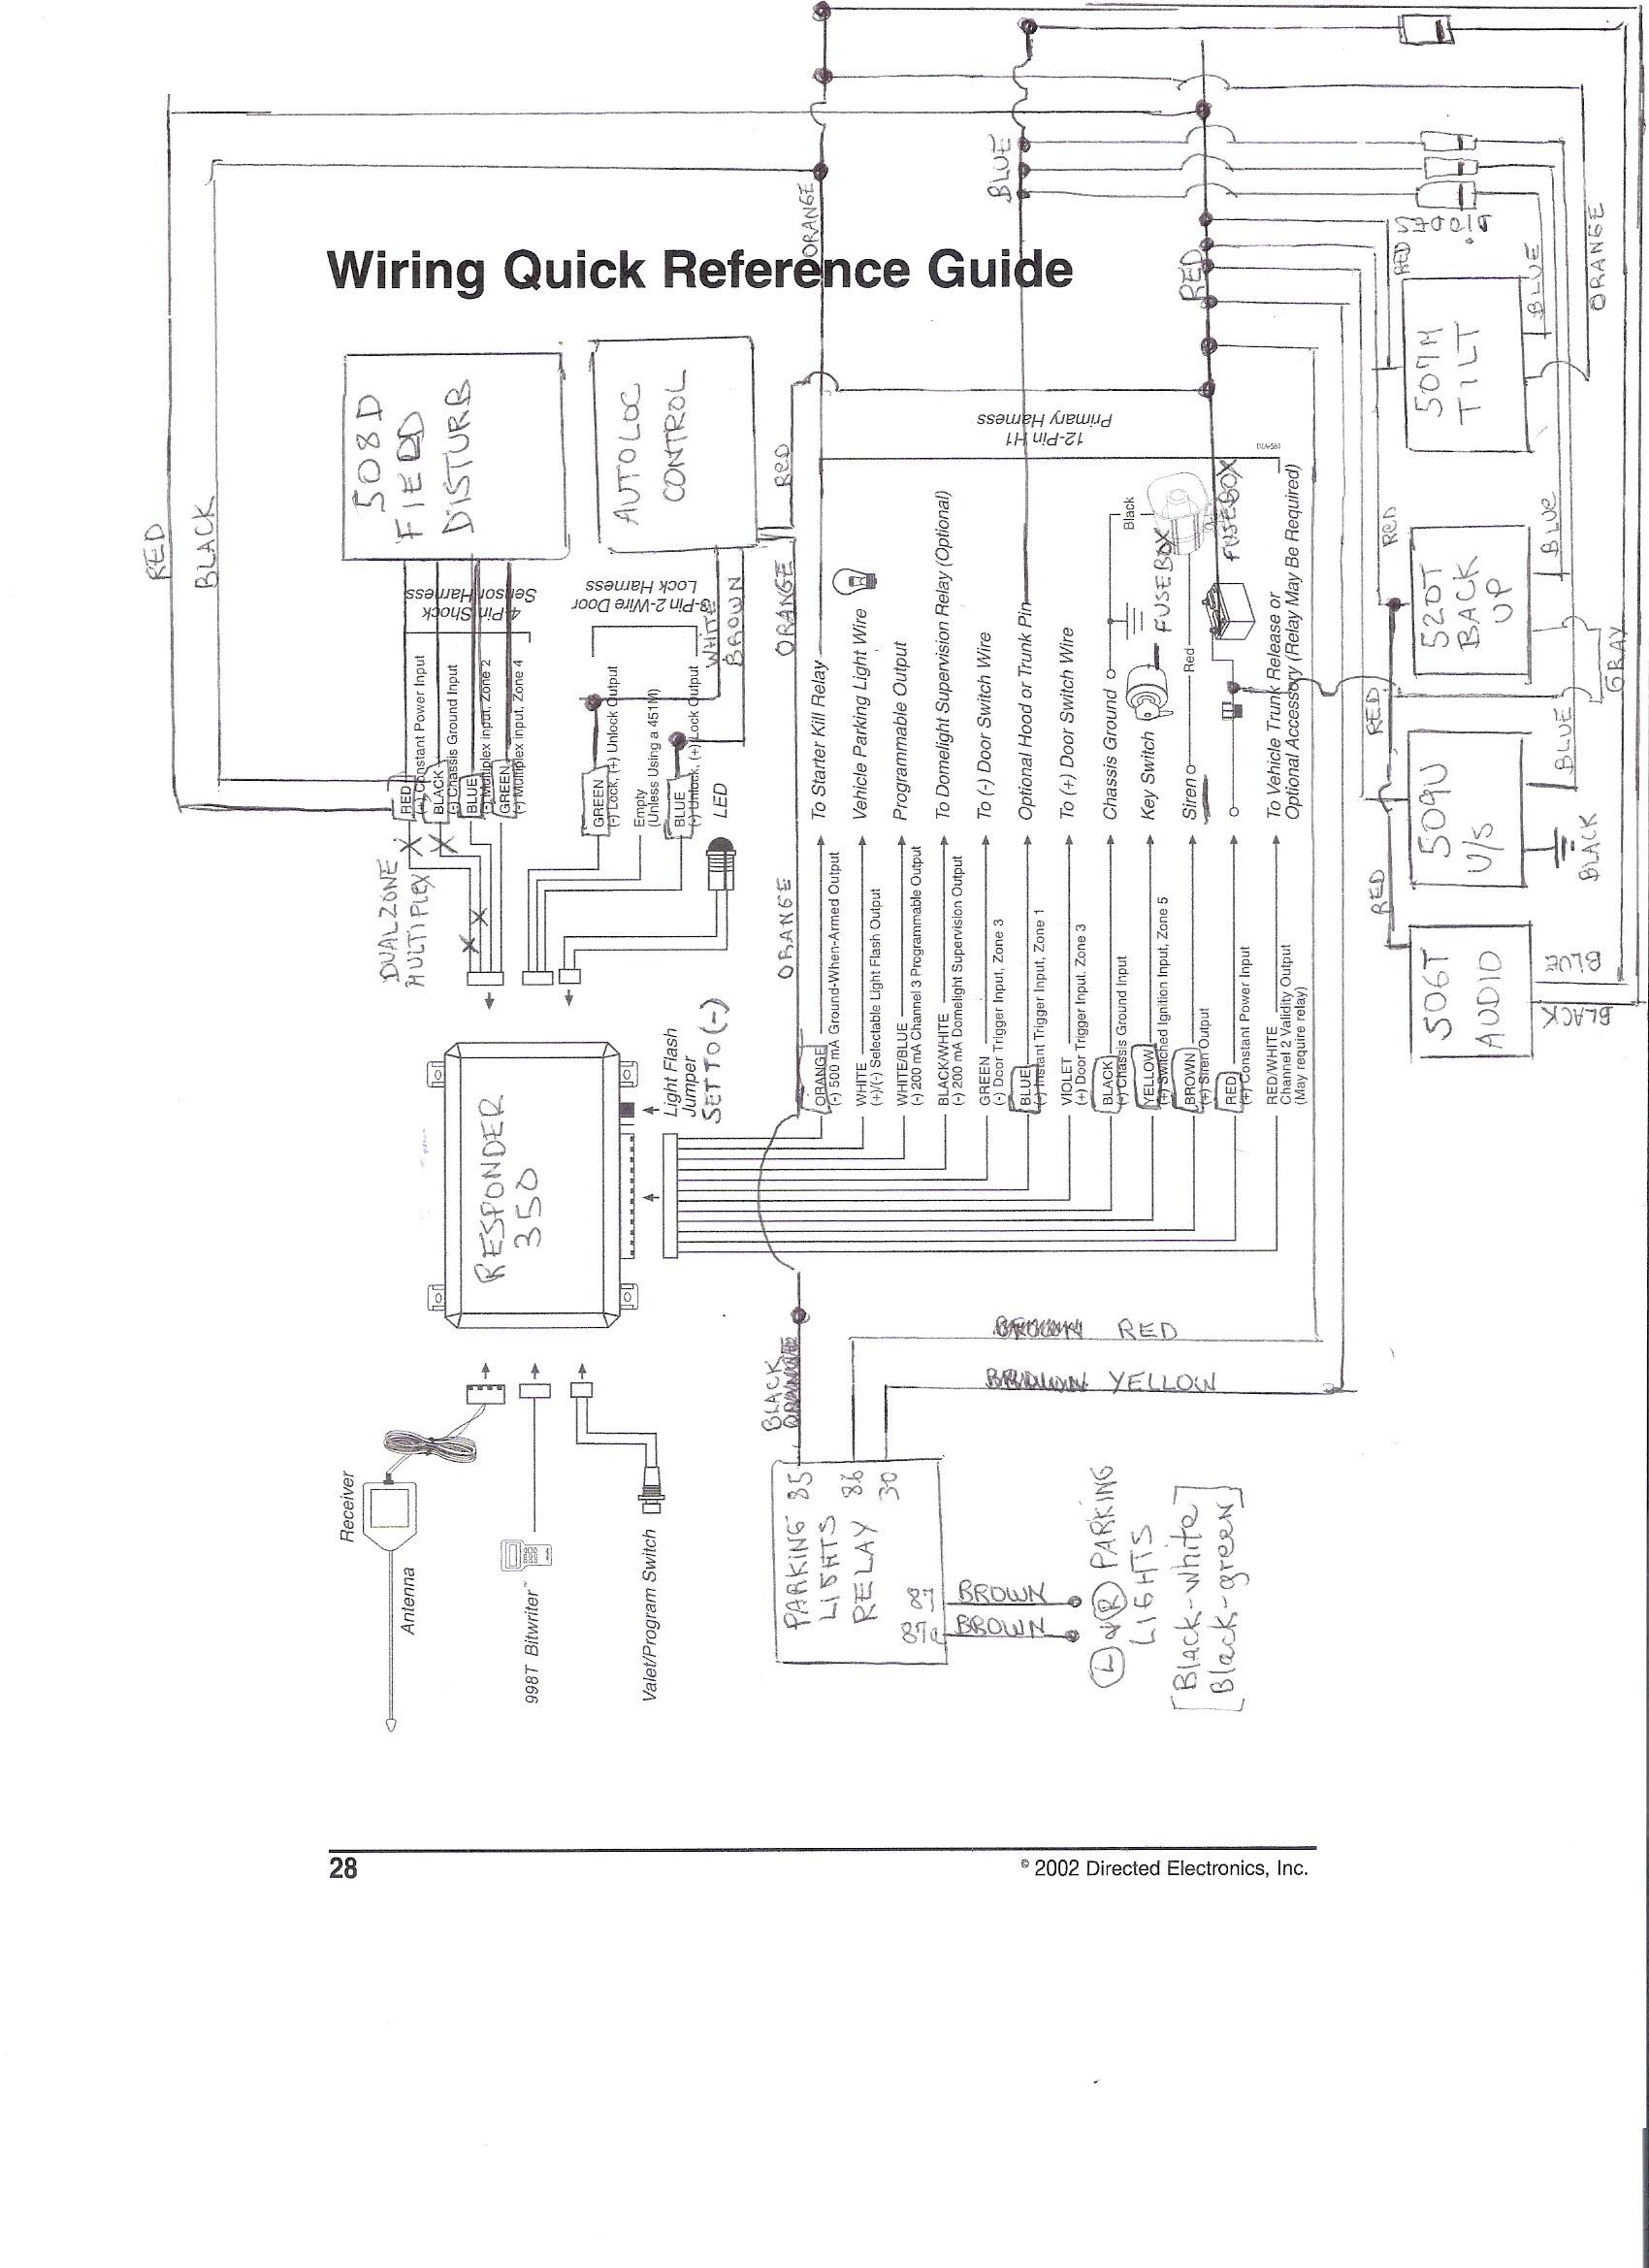 Autoloc Wiring DiagramsNetlify